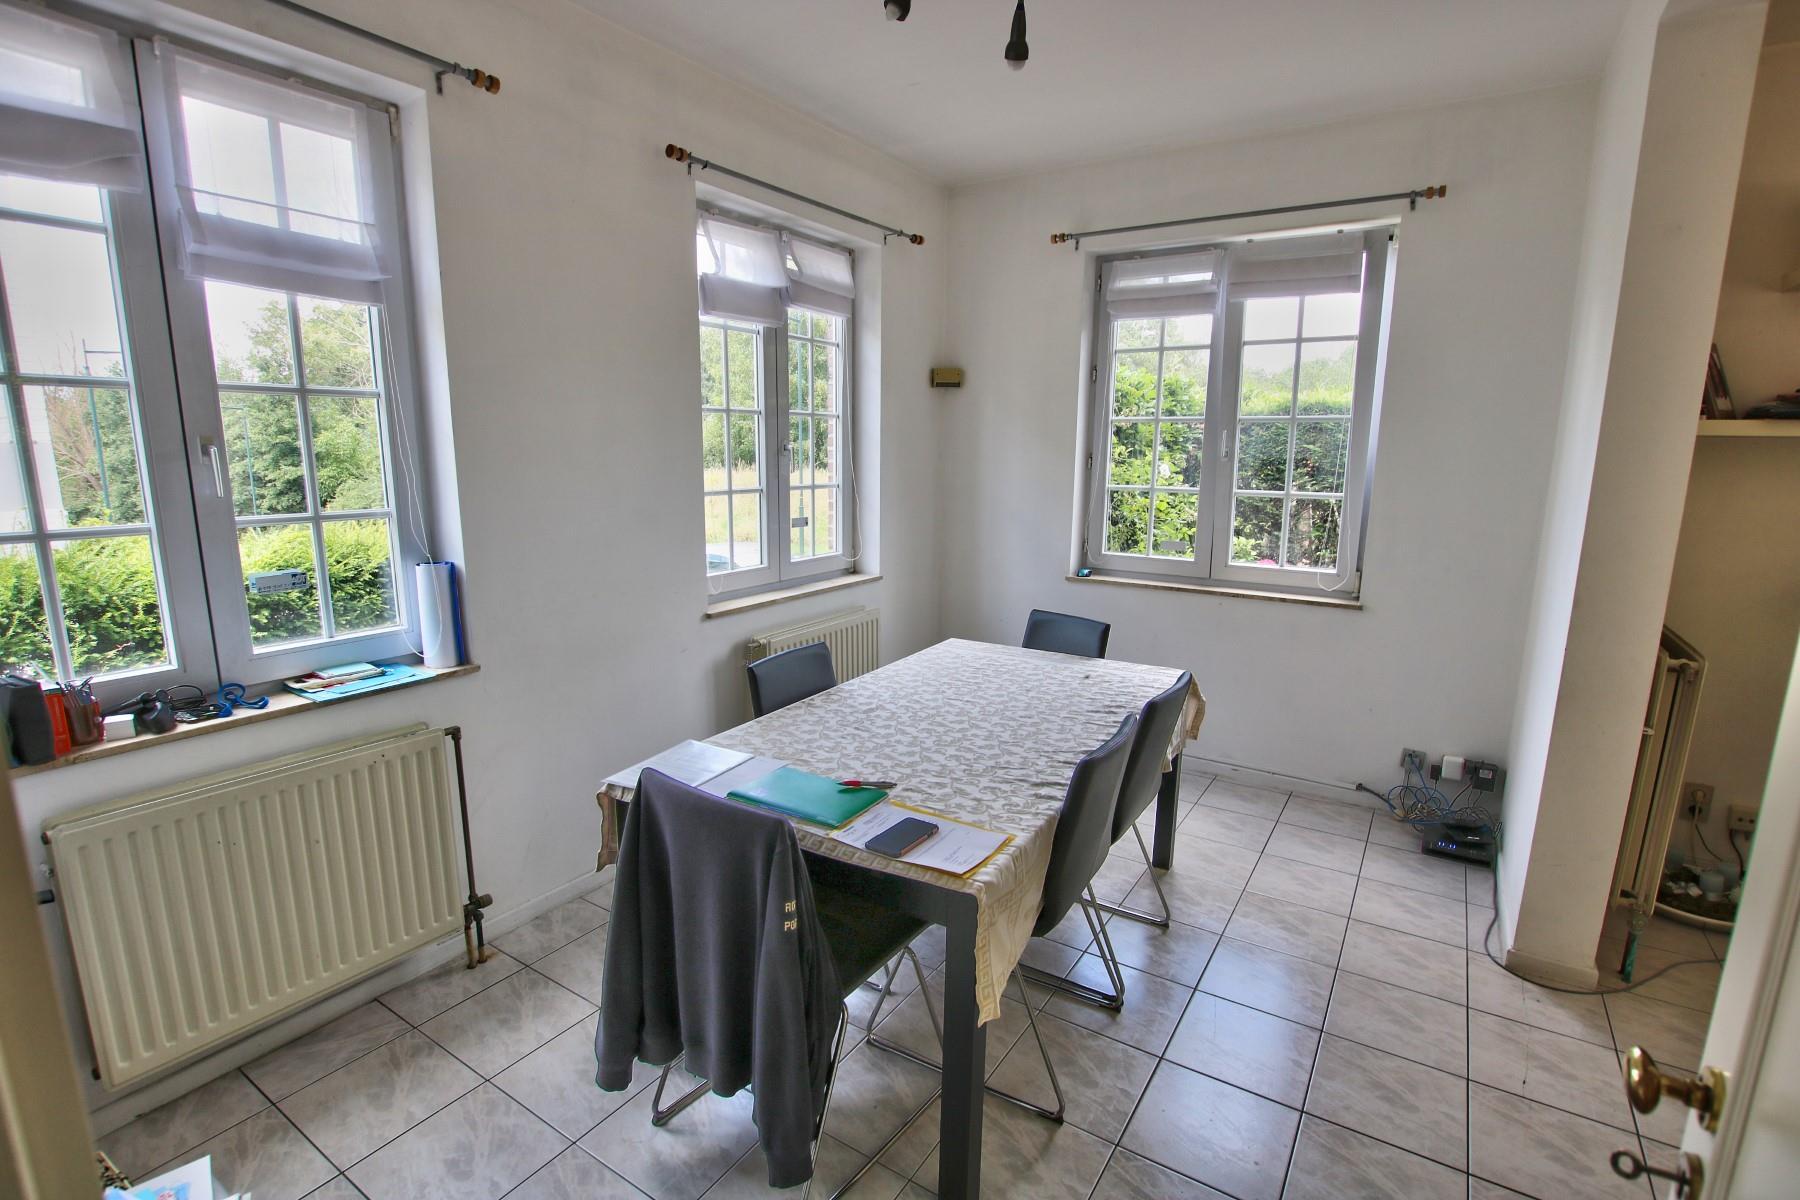 Huis - Woluwe-Saint-Lambert - #4103954-5